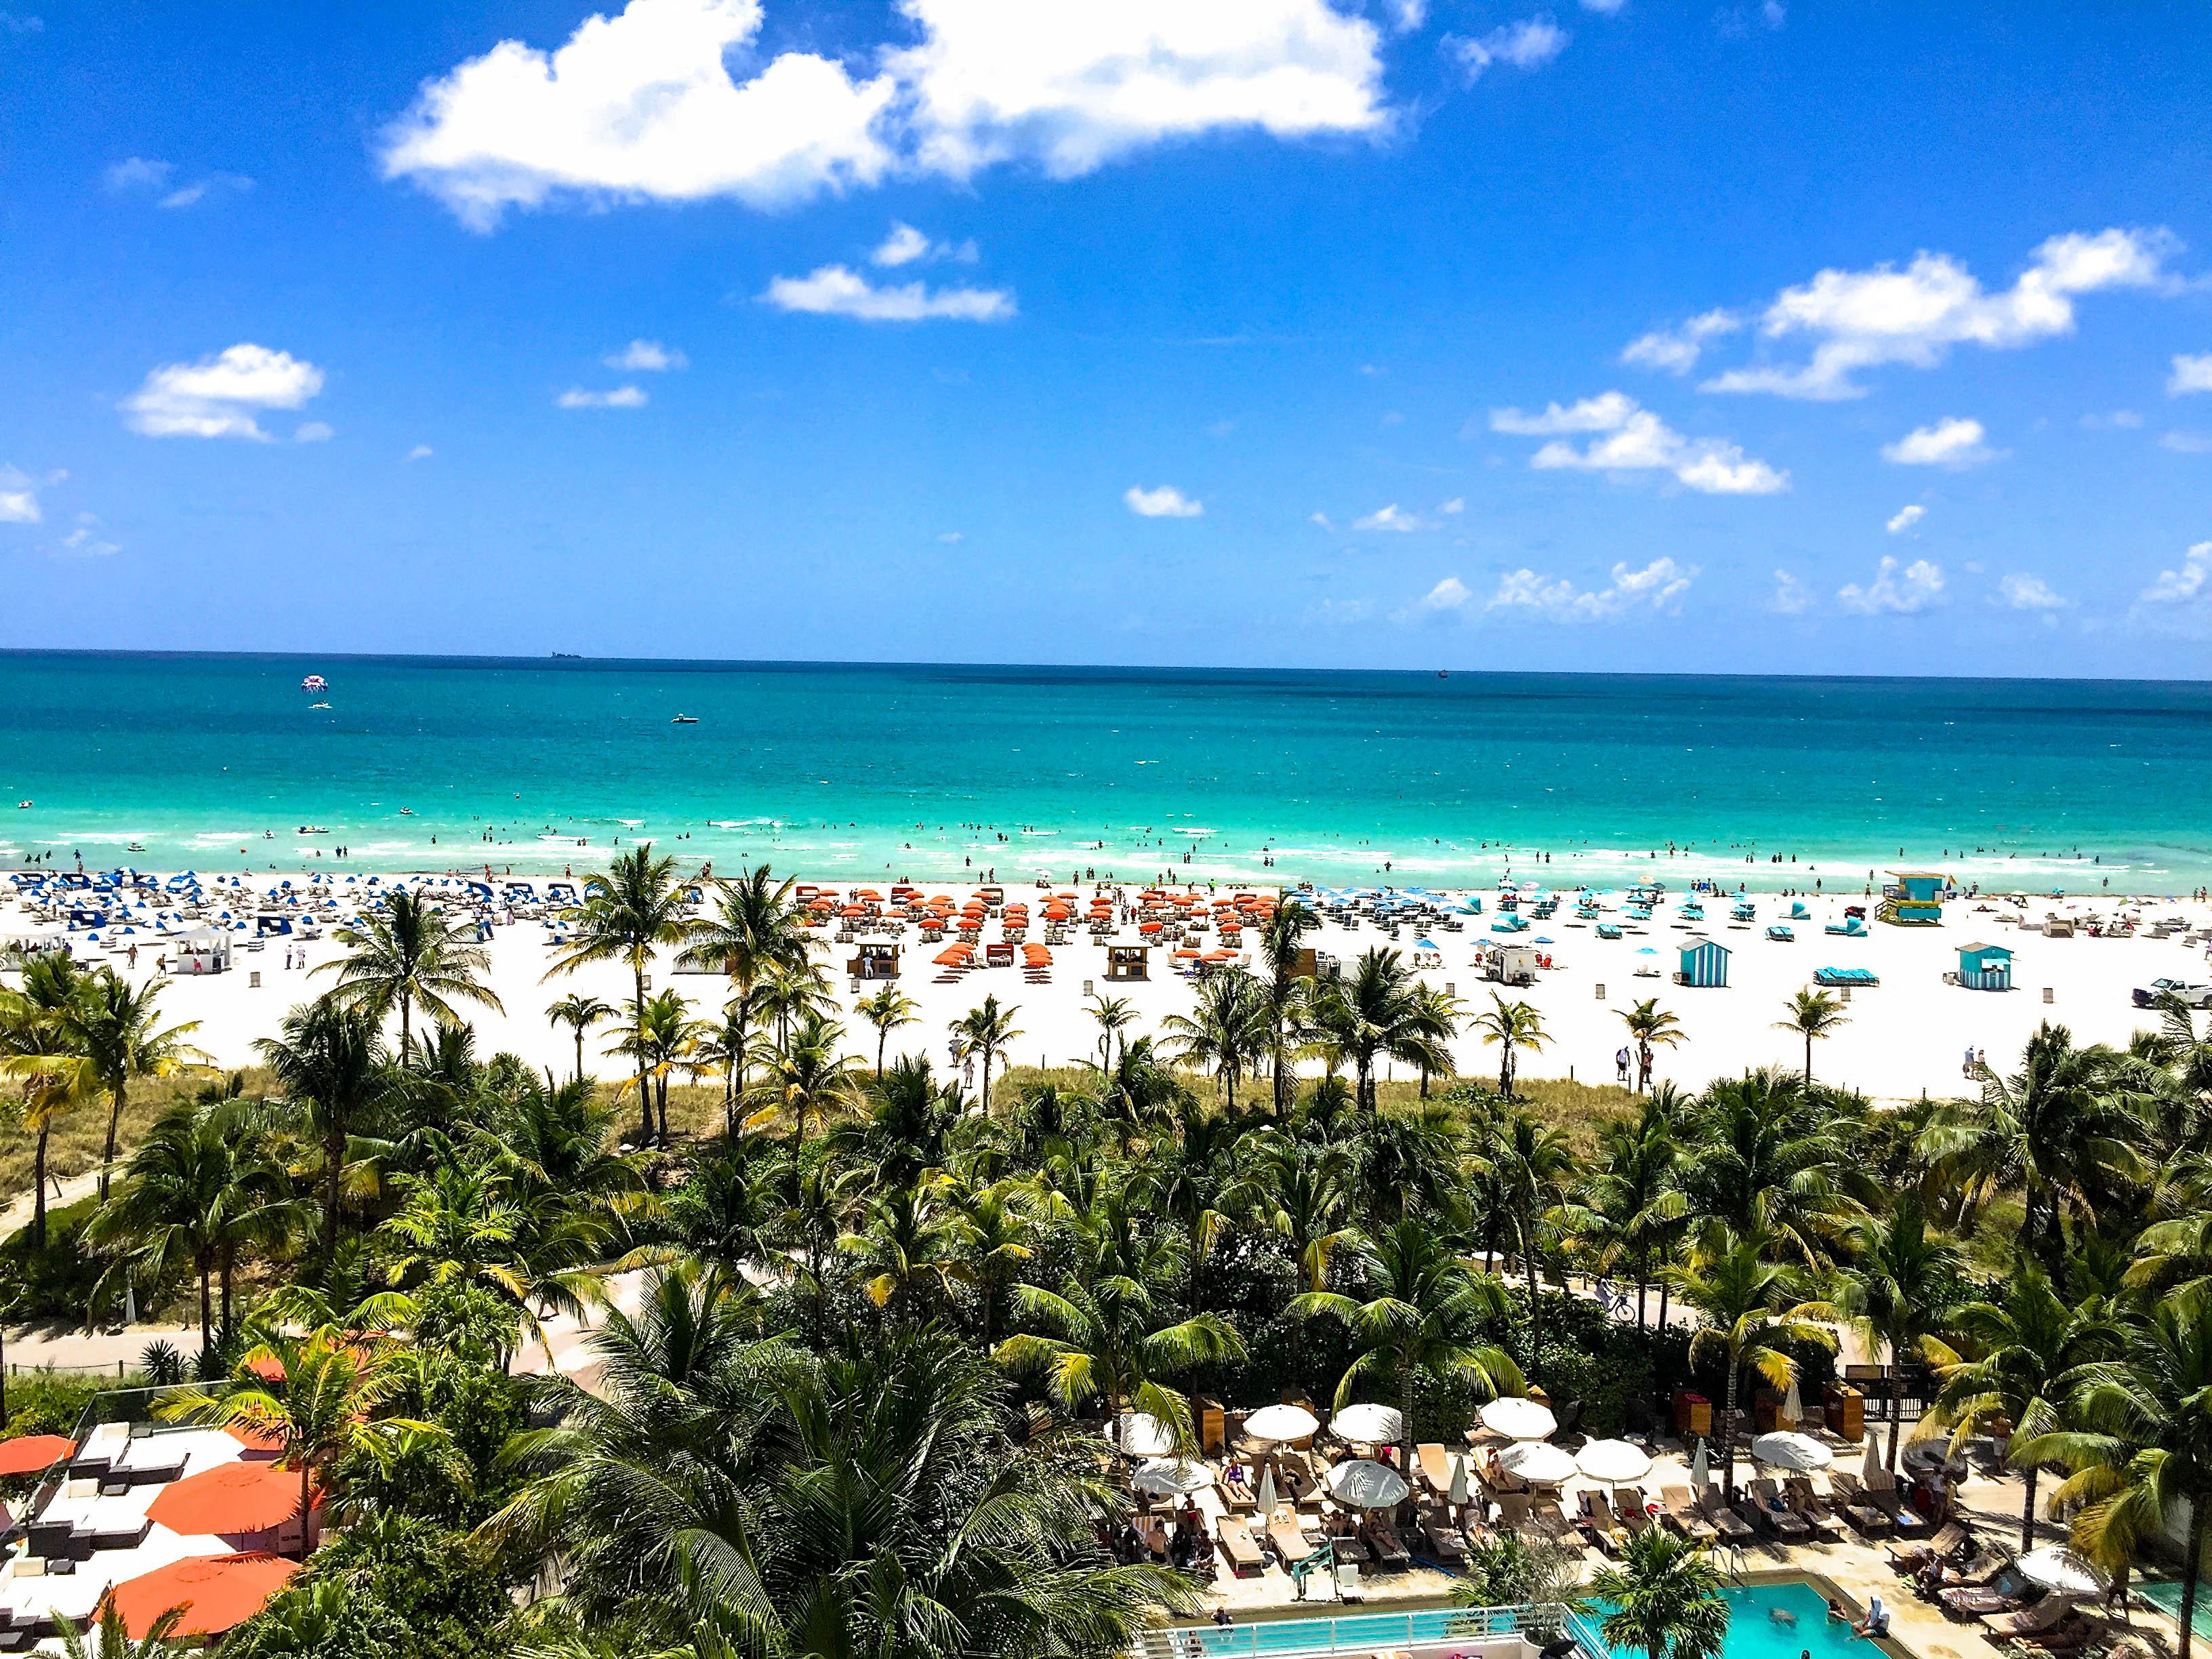 A Weekend Getaway in South Beach Miami